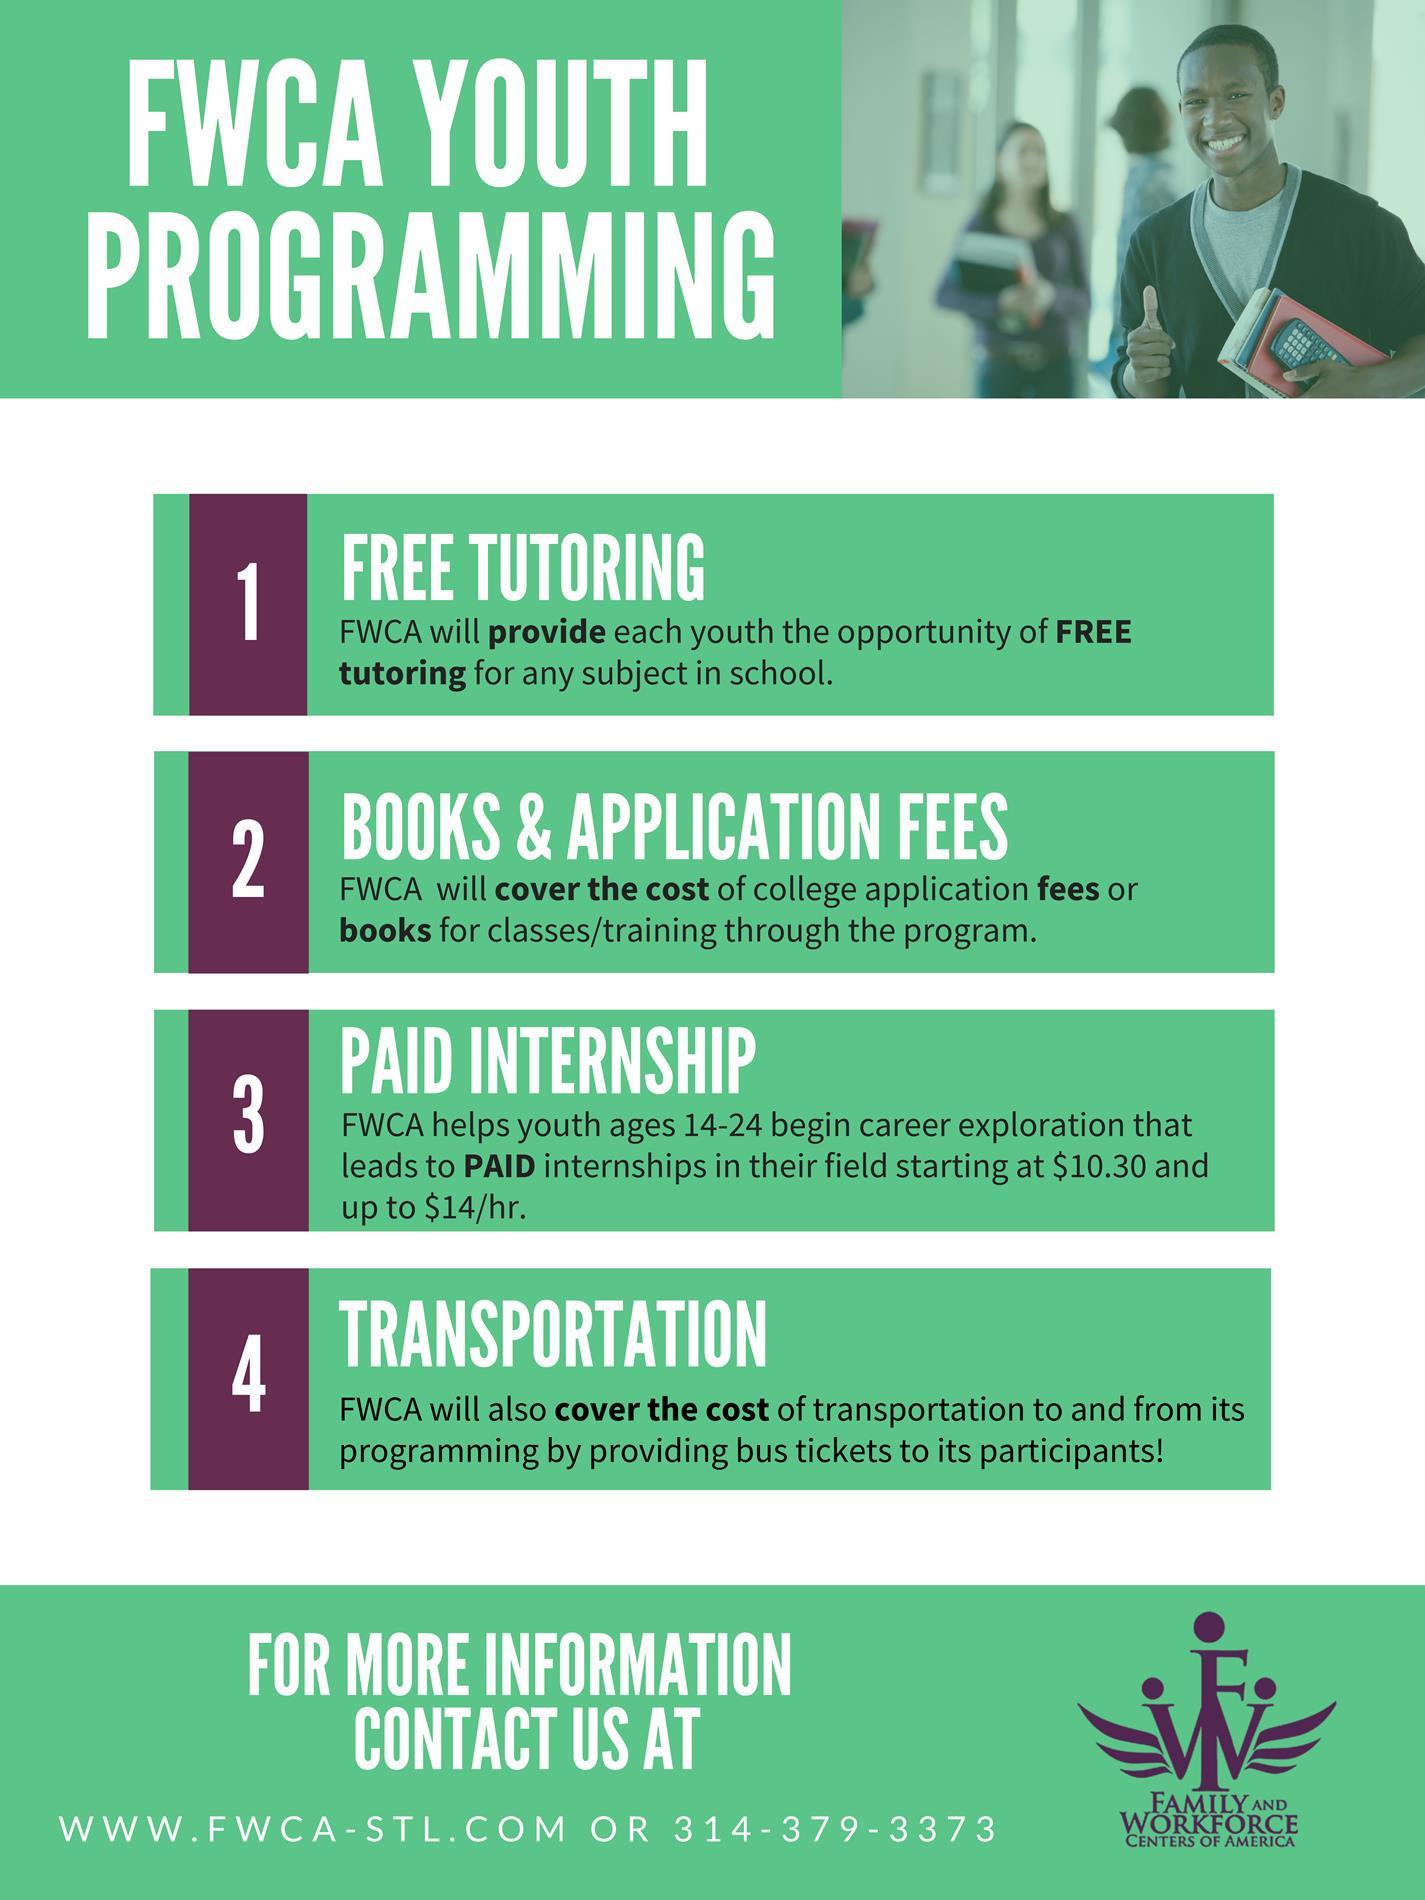 VWCA Youth Programming